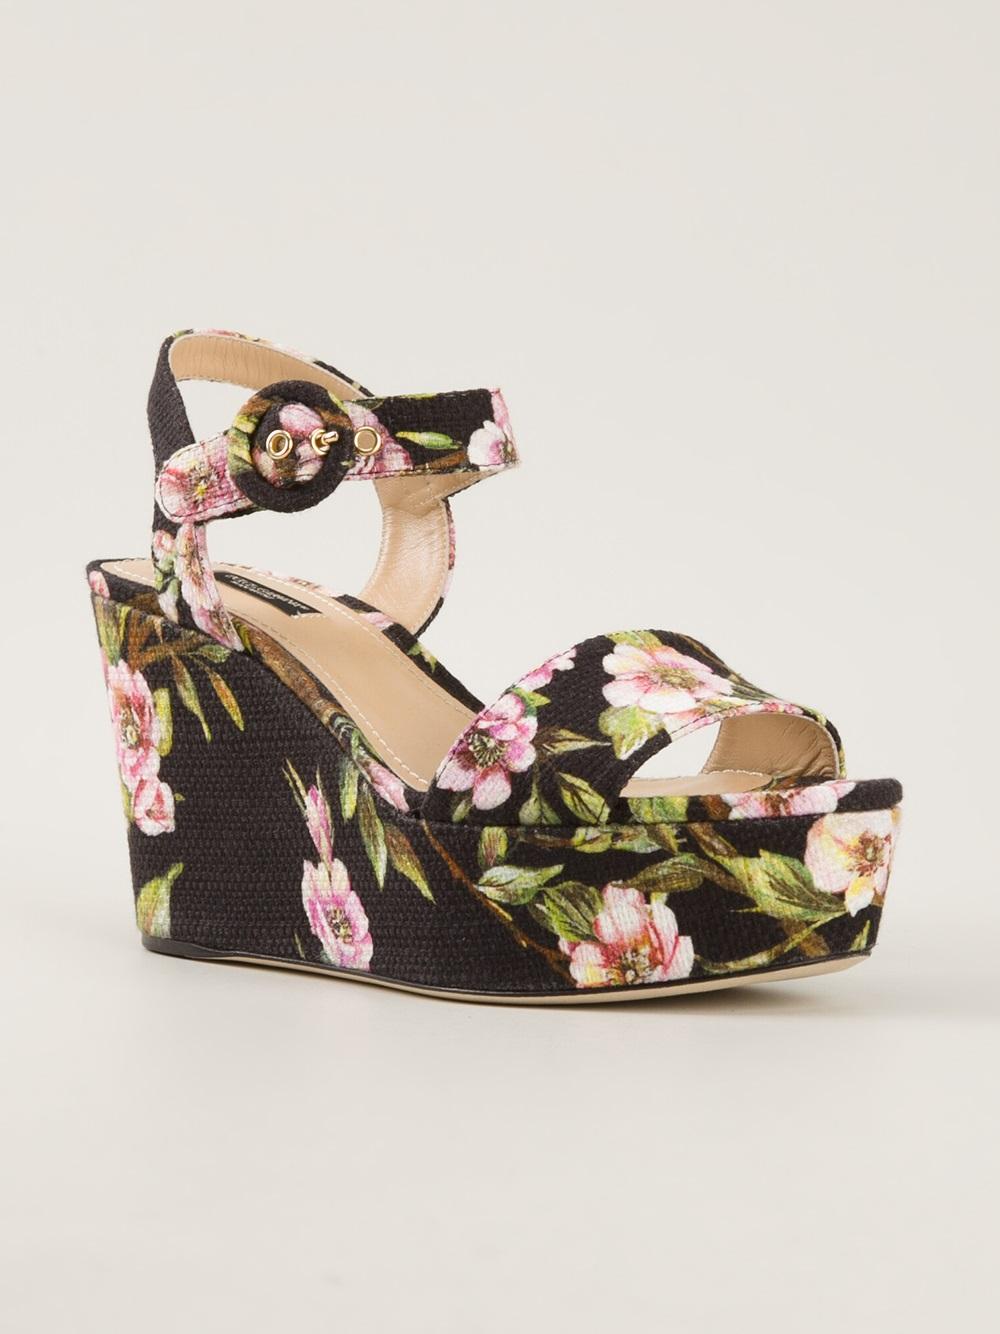 0d0d5cf73a6 Lyst - Dolce   Gabbana Floral Print Wedge Sandals in Green